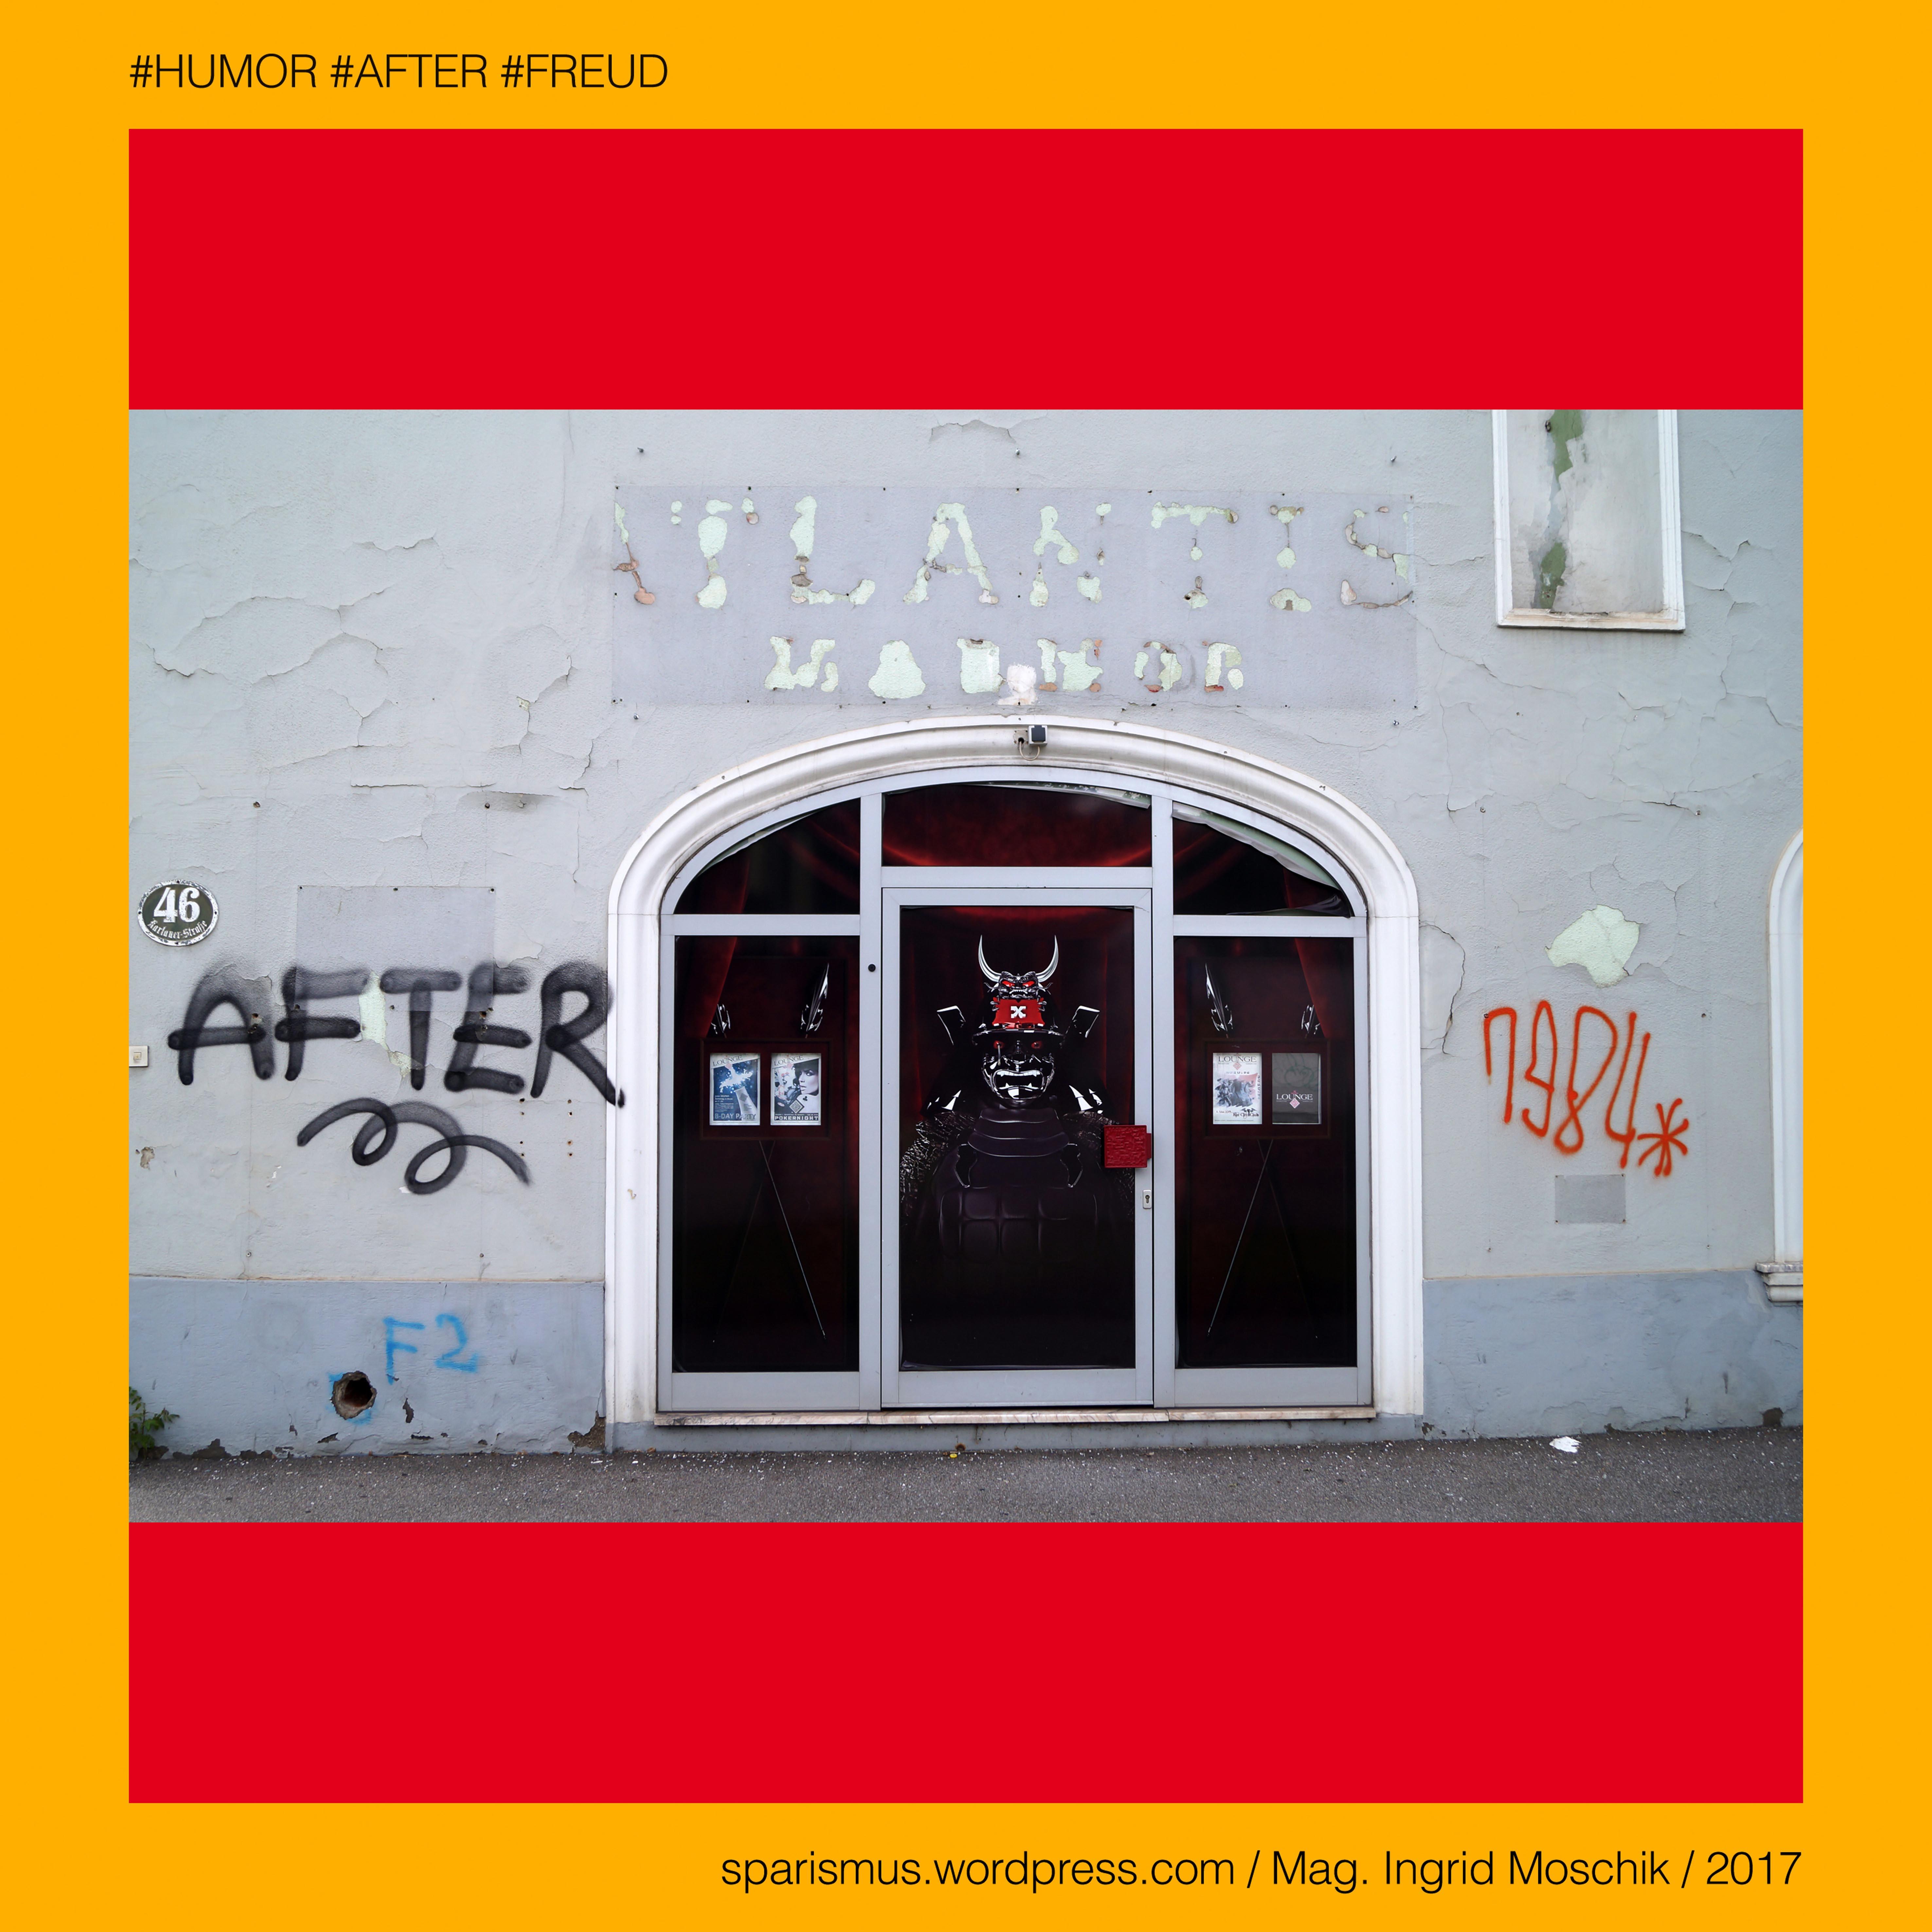 HUMOR AFTER FREUD – vanishing ATLANTIS 1984 – Karlauerstrasse